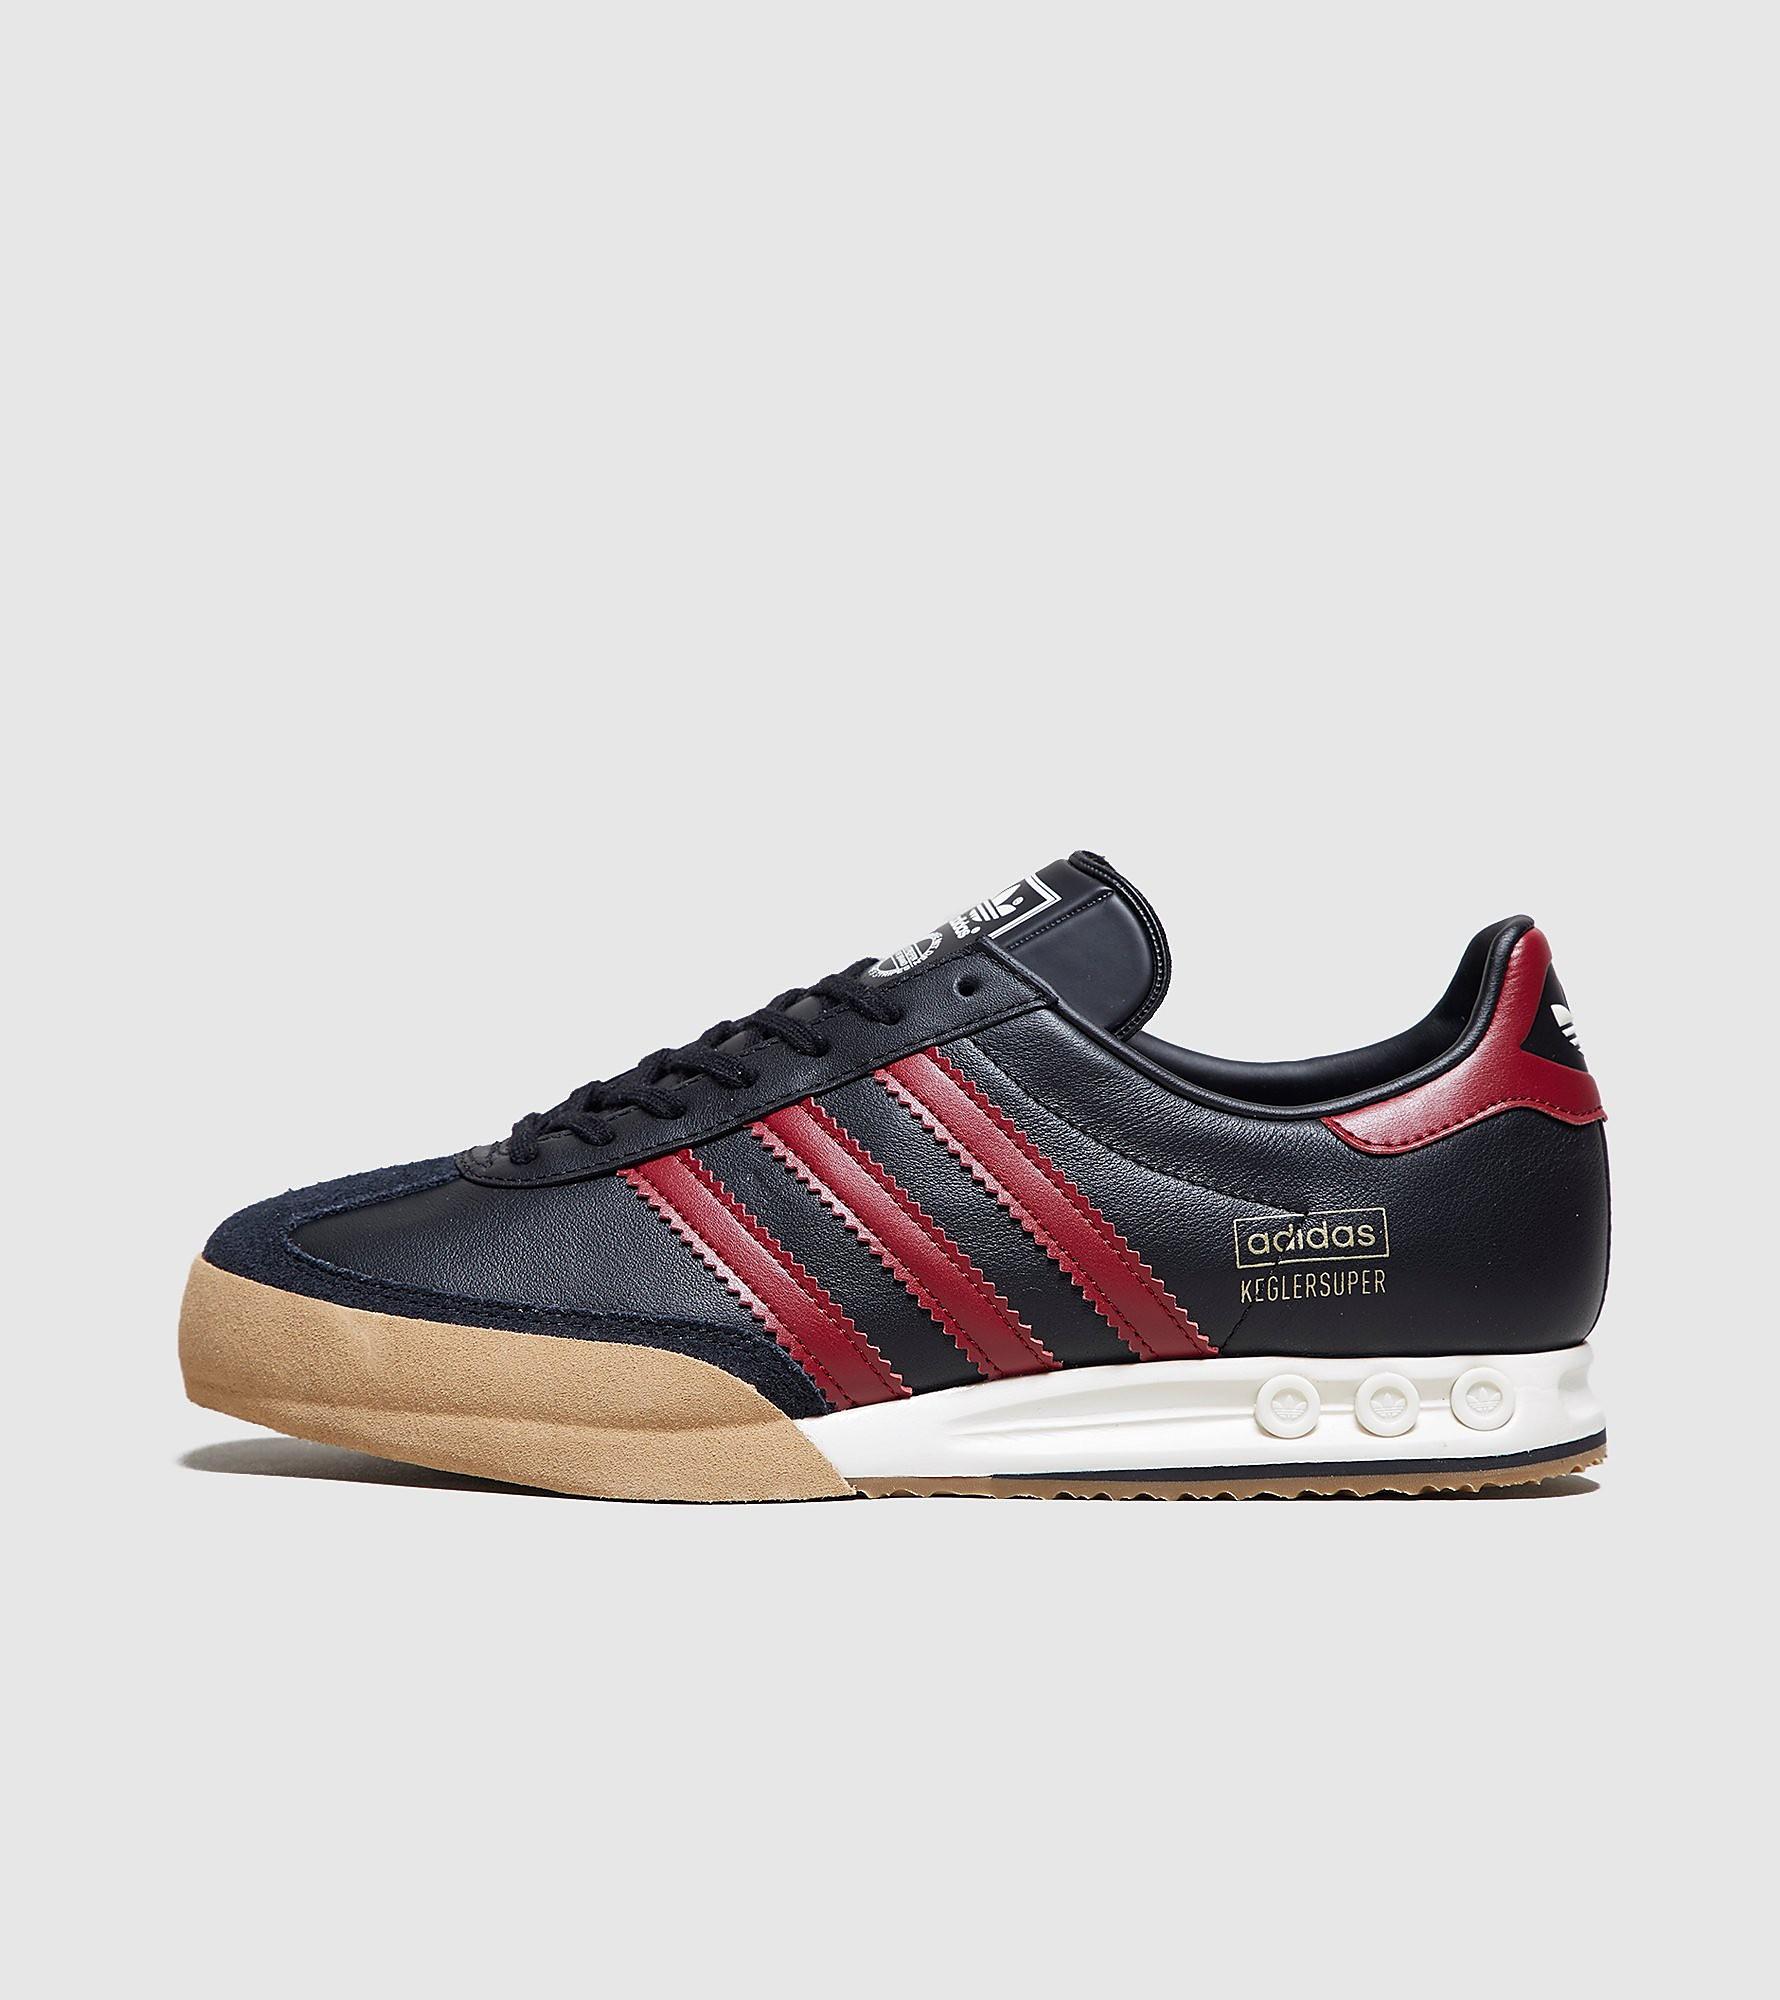 Sneaker Adidas adidas Originals Kegler Super OG - size? Exclusive